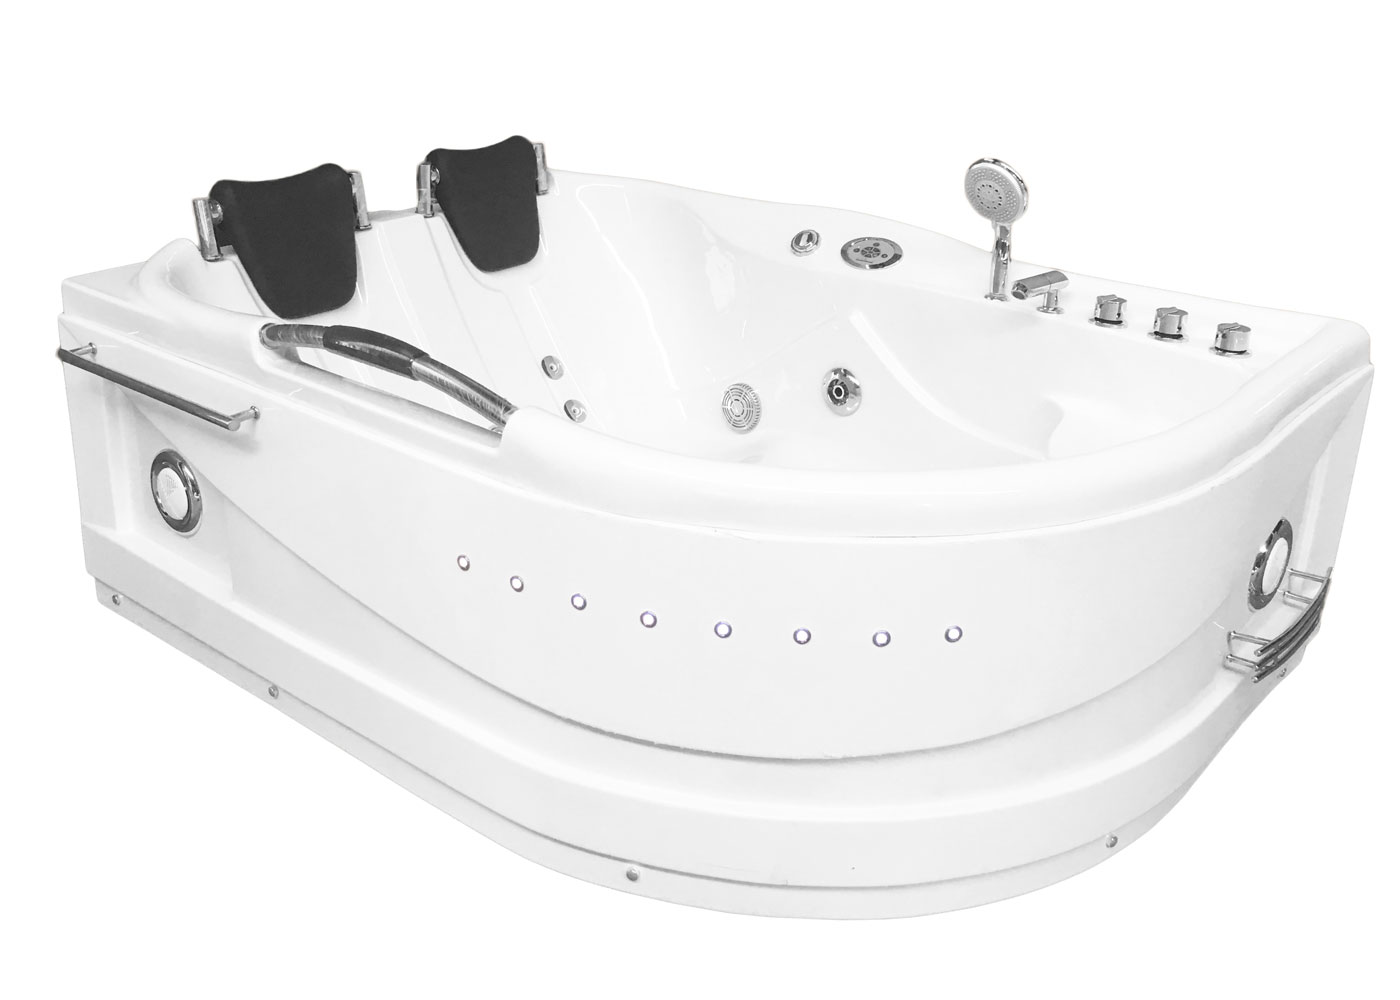 whirpool-bathtub-hot-tub-Cayman2